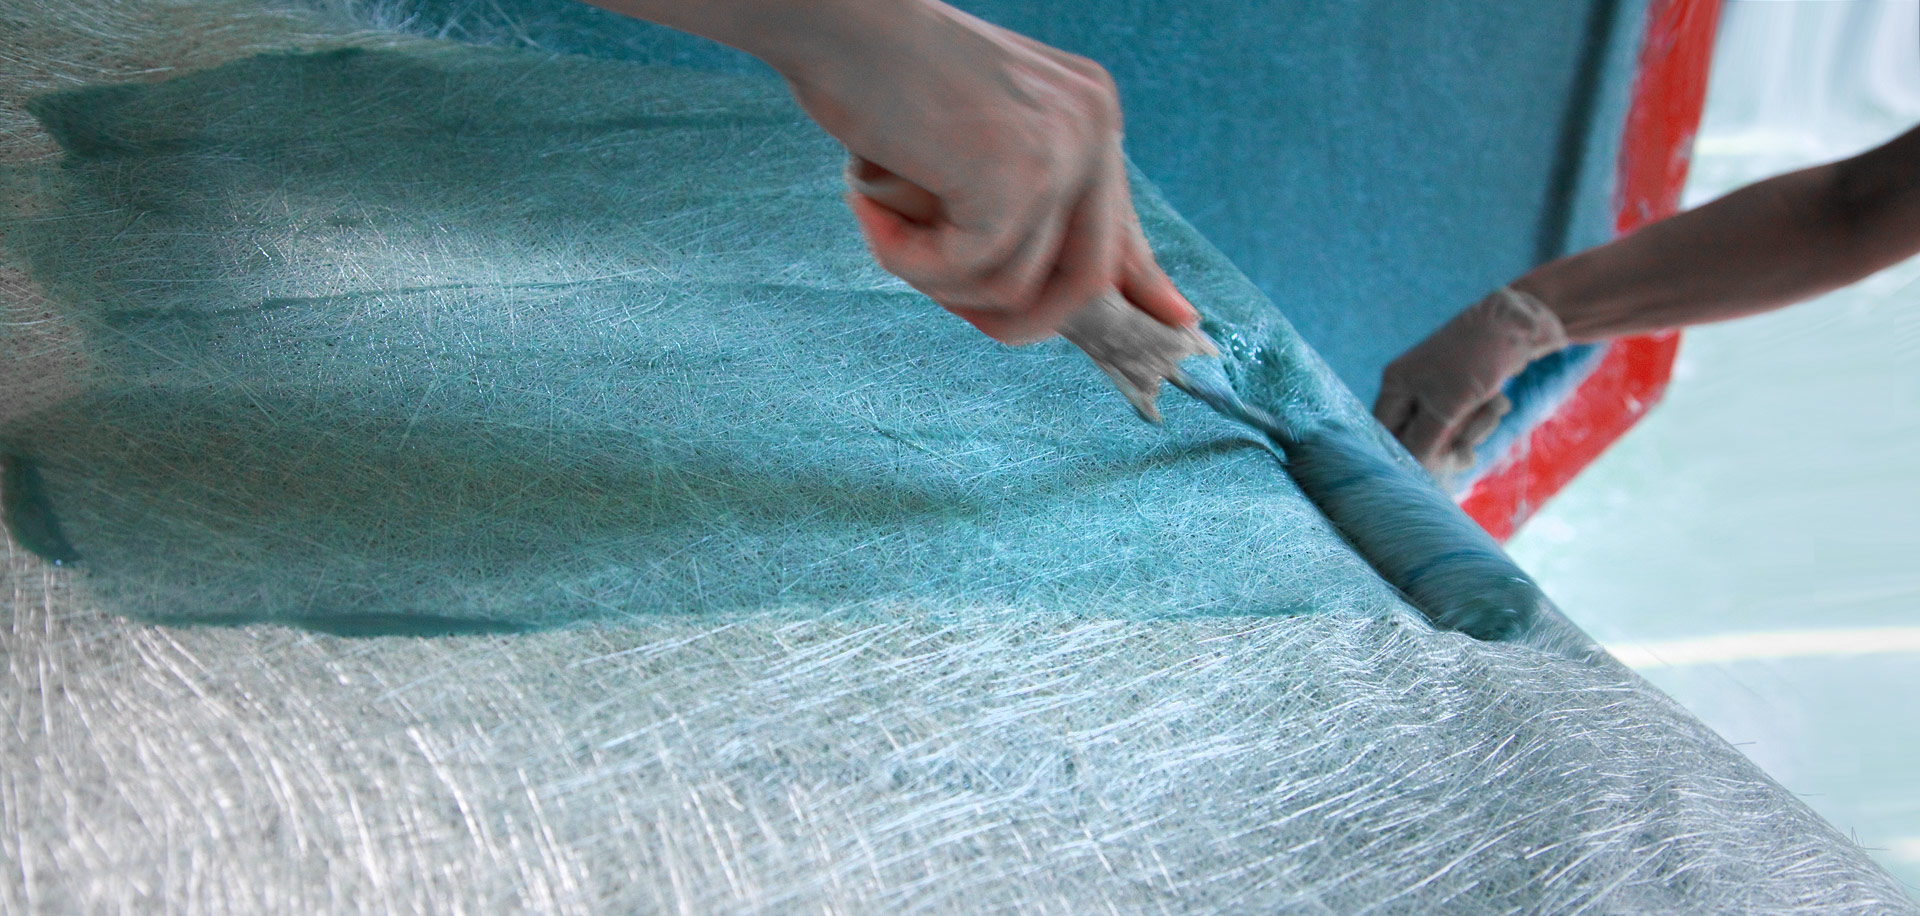 laminowanie - produkcja laminatu